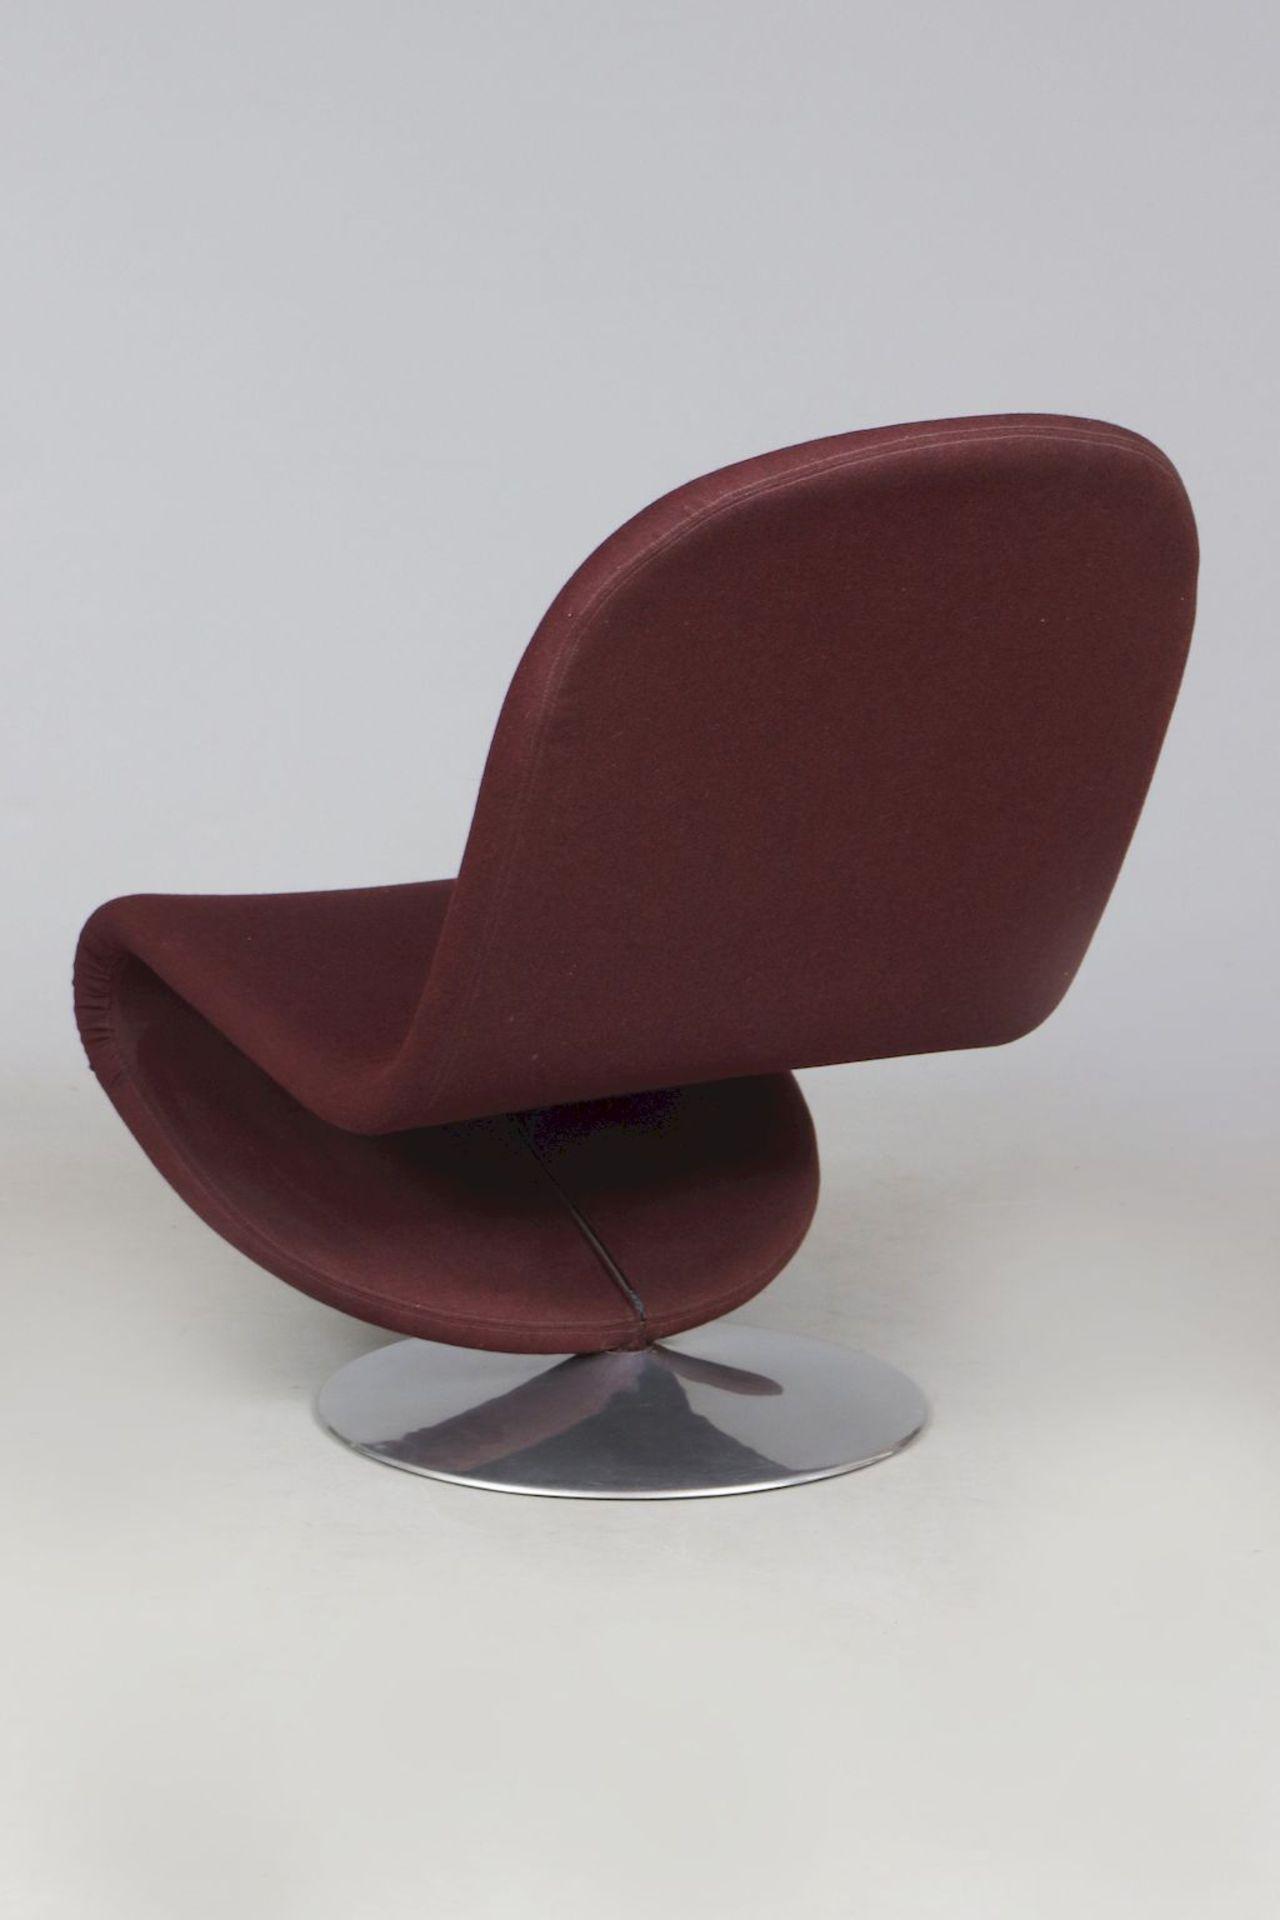 VERNER PANTON 1-2-3 Lounge Chair - Image 3 of 4